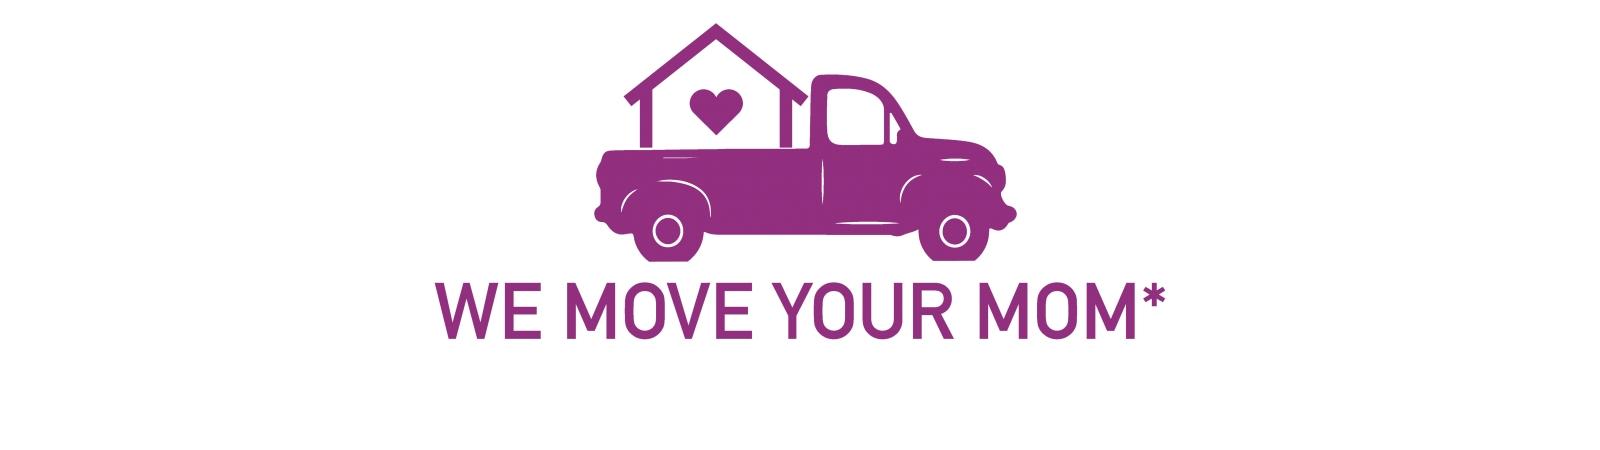 We Move Your Mom | Auction Ninja